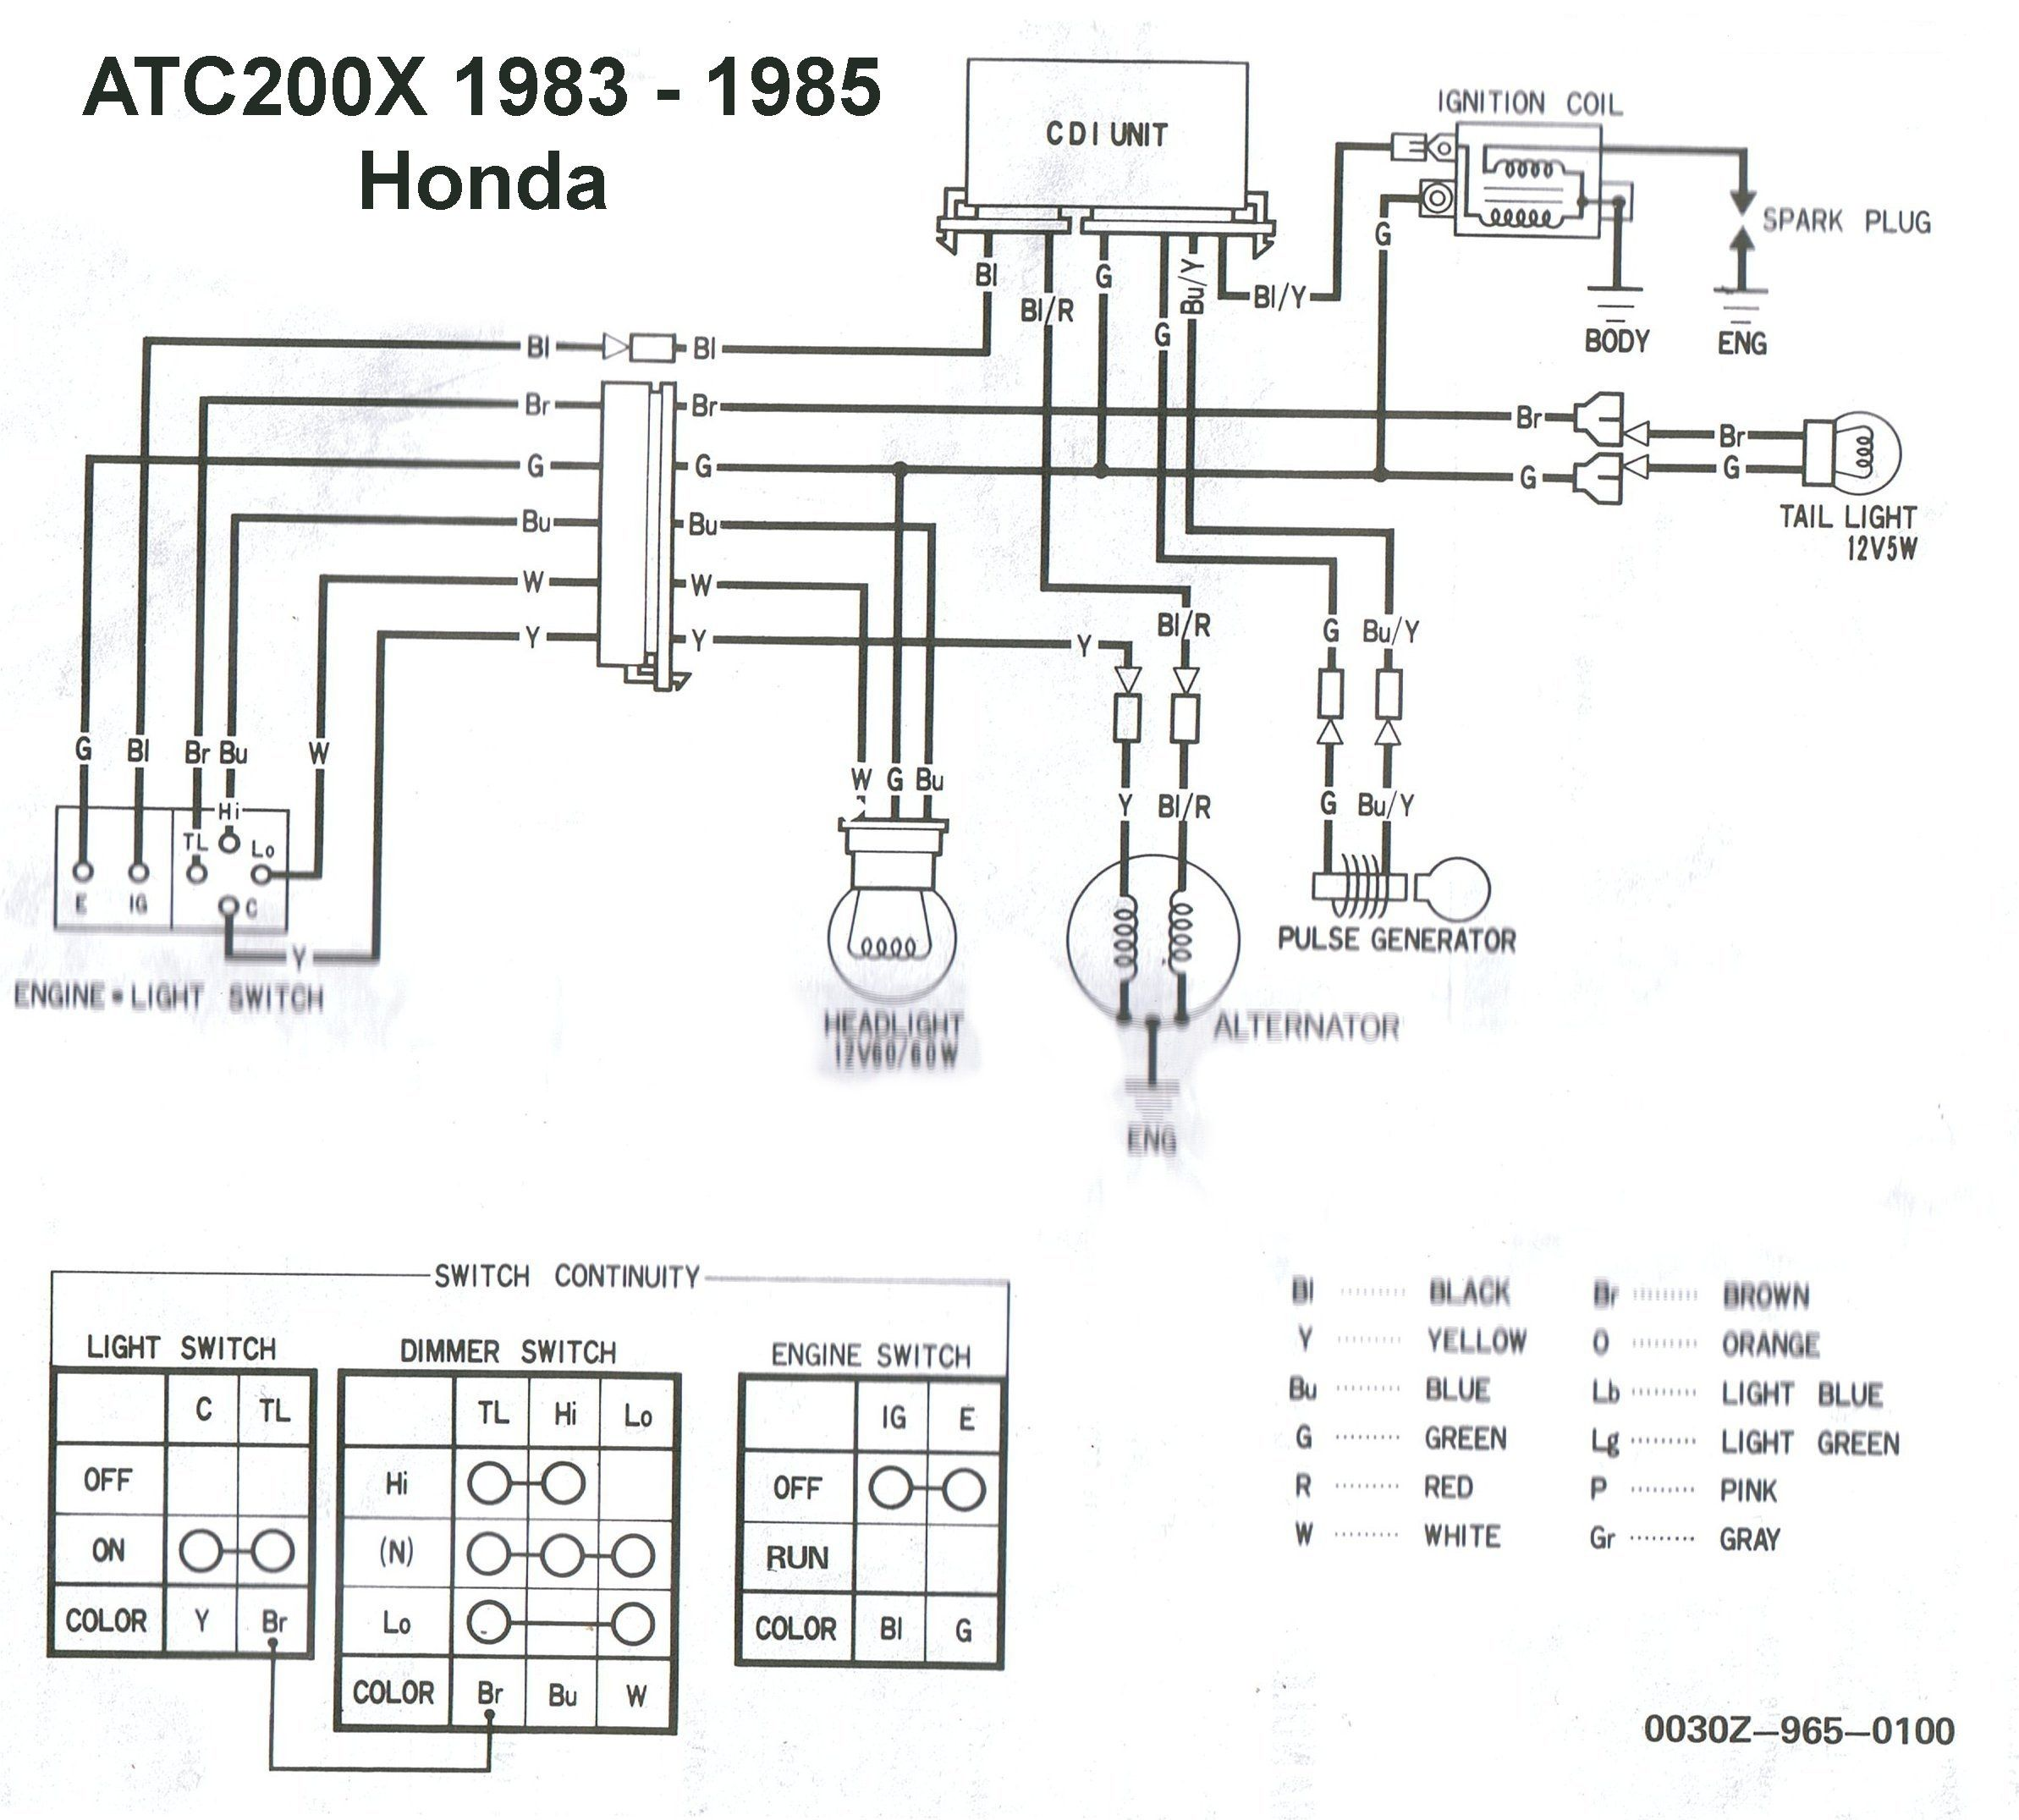 Wiring Diagram Honda Atc200x 1983 Thru 1985 Factory